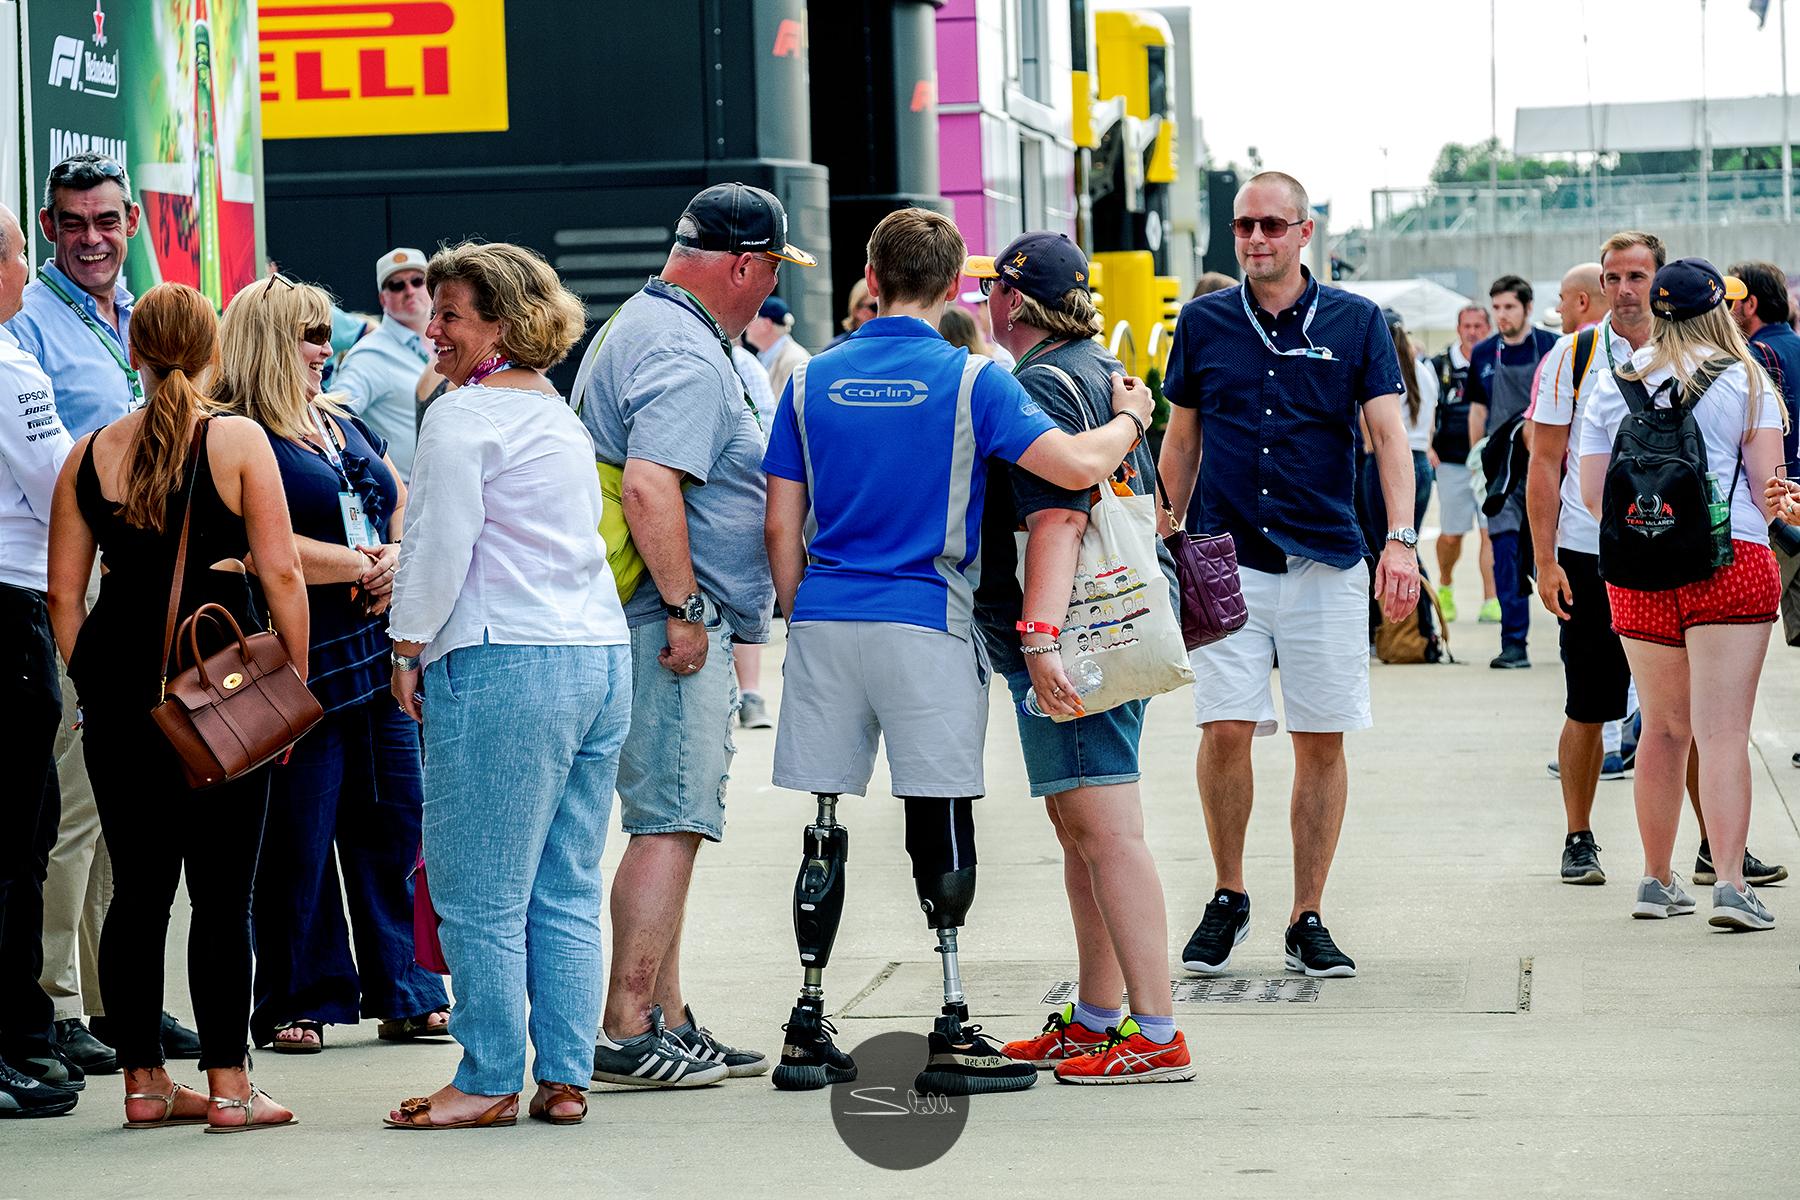 Stella Scordellis British Grand Prix 2018 79 Watermarked.jpg